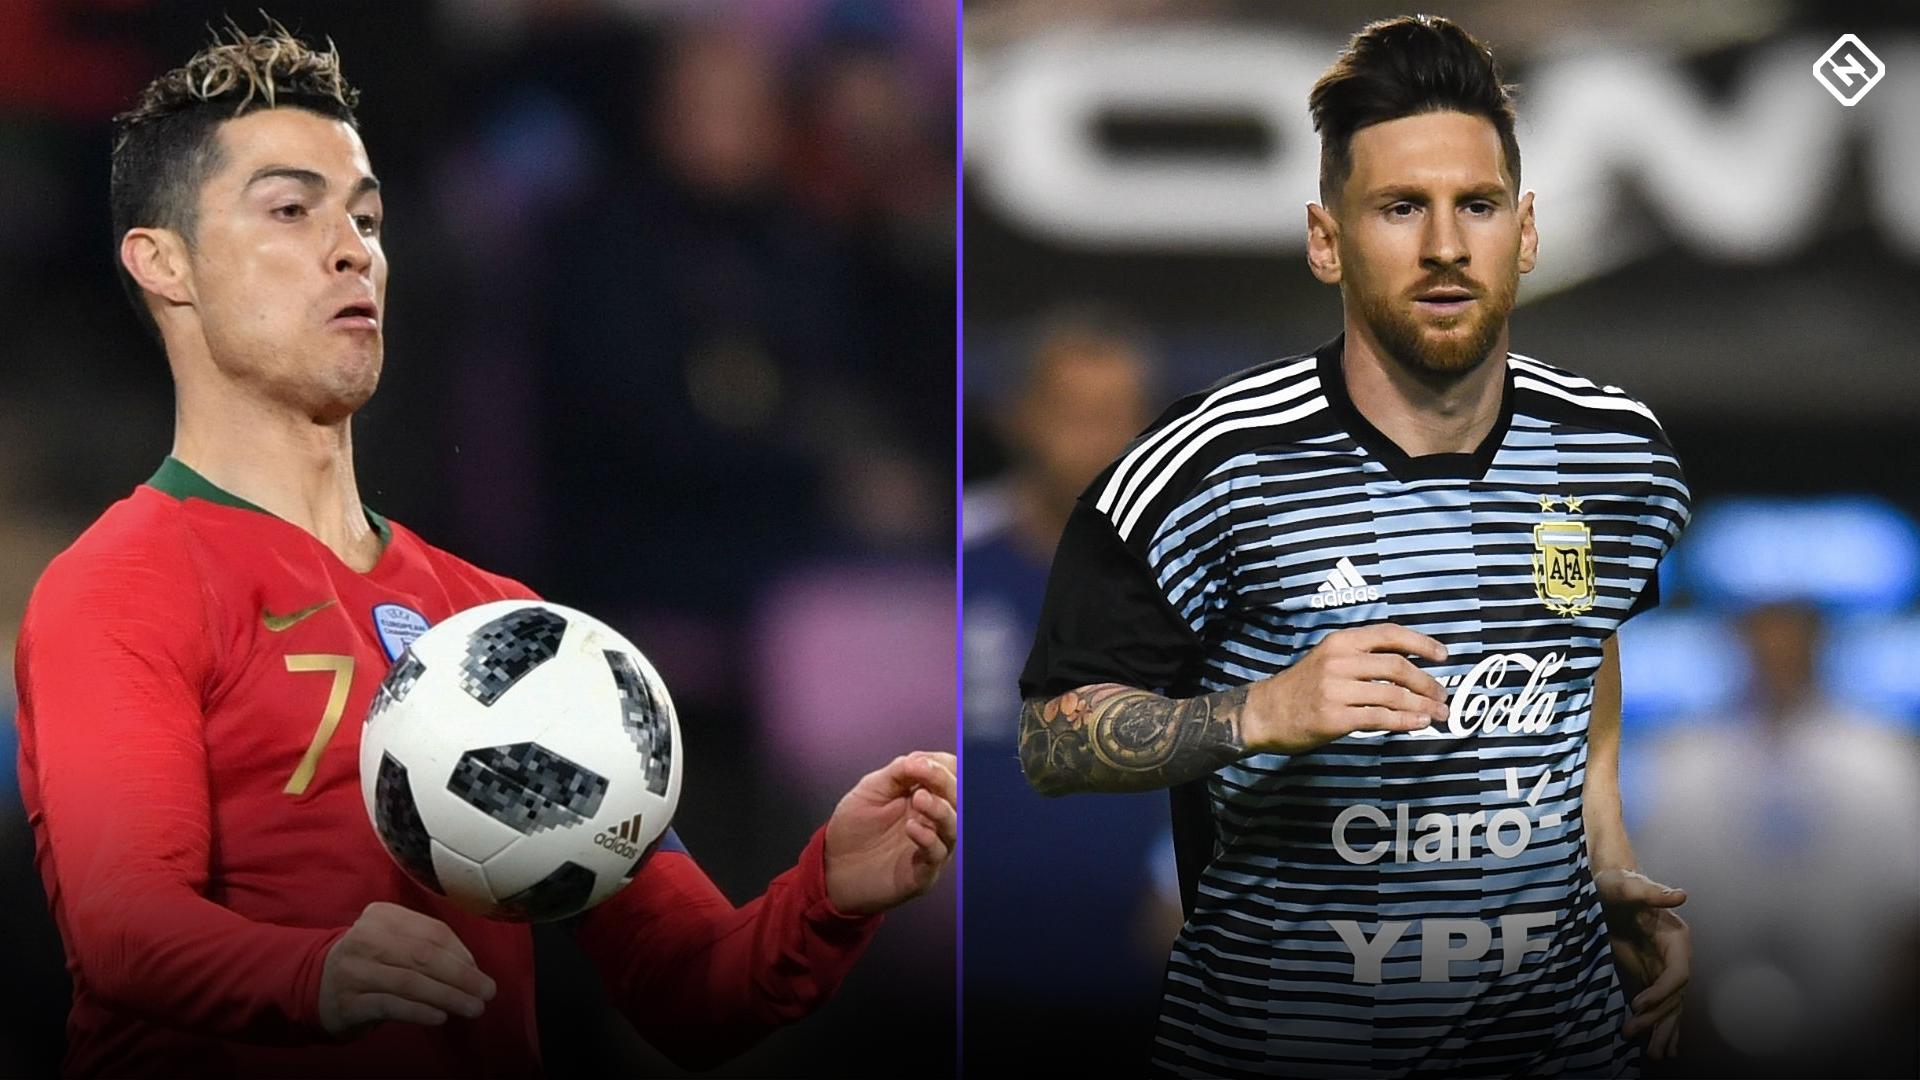 Ronaldo vs. Messi ftr